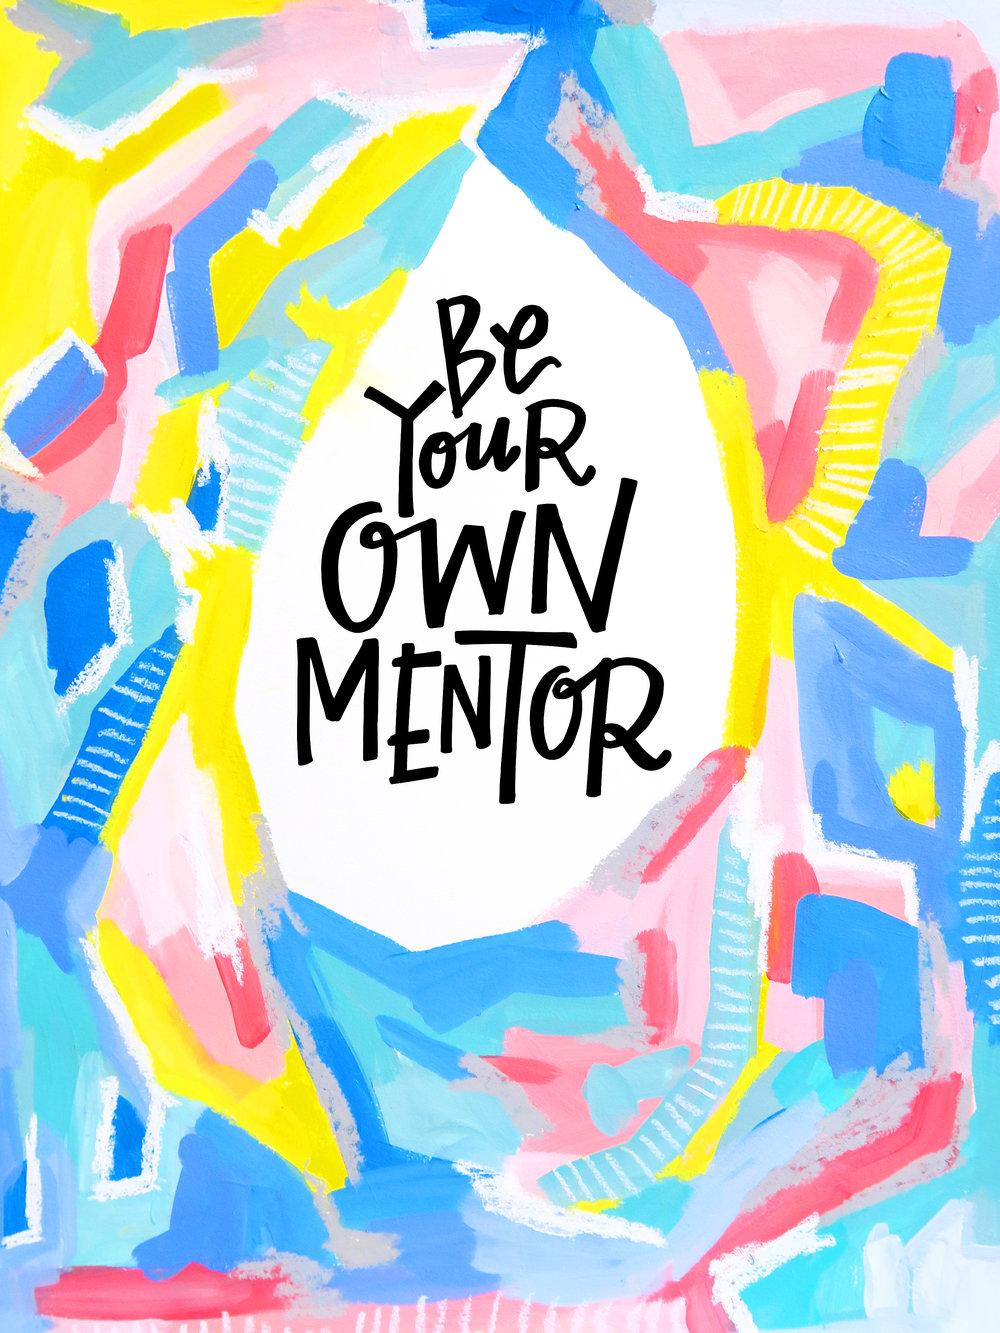 4/13/16: Mentor